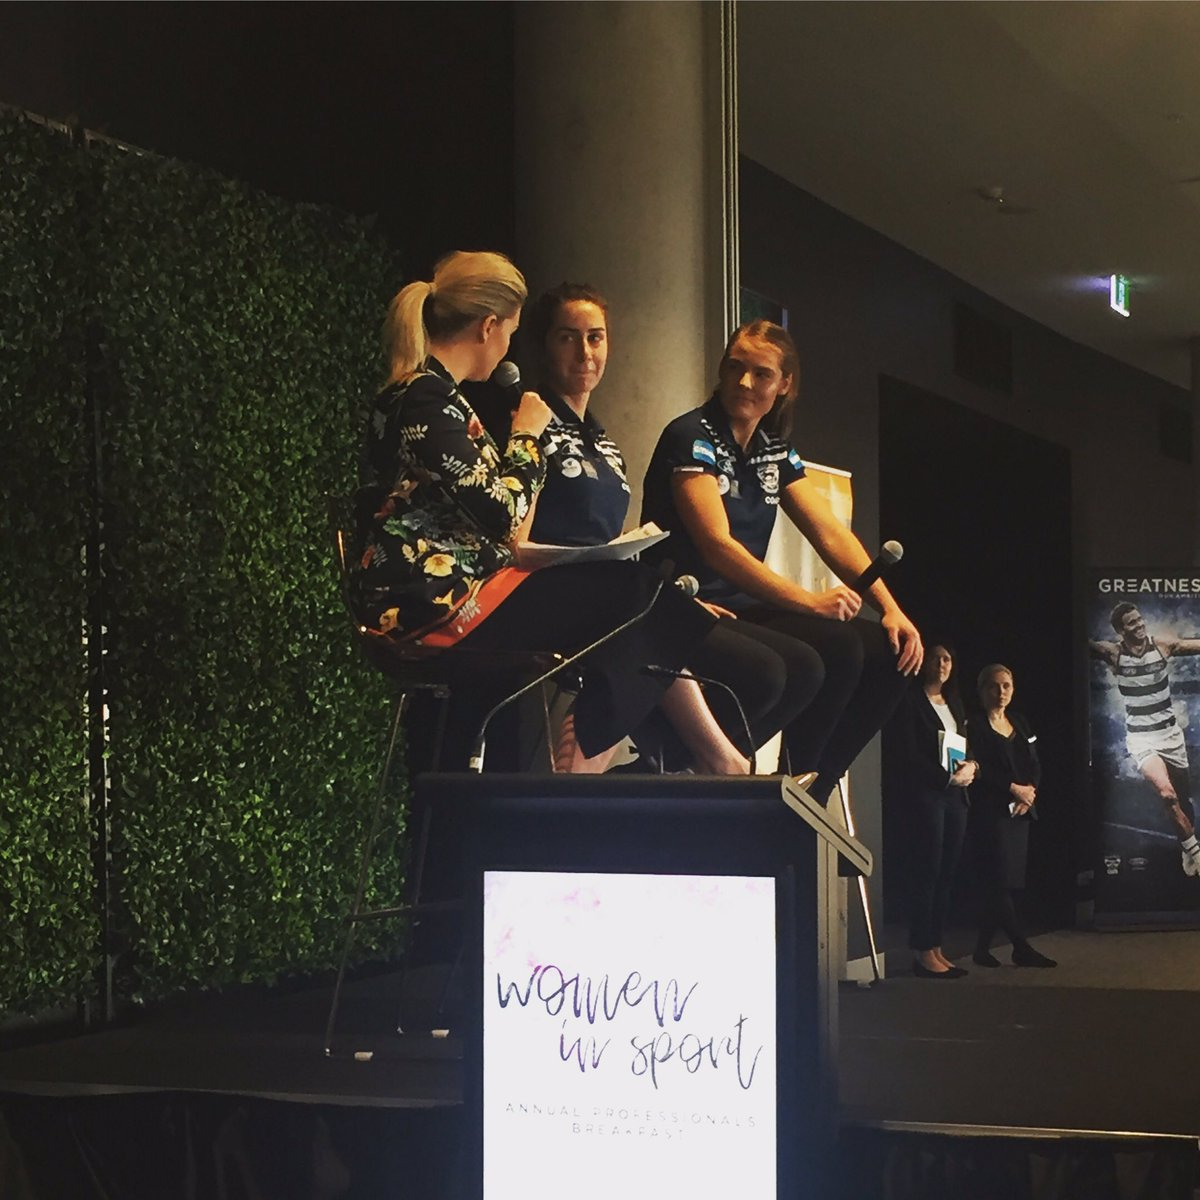 Inspirational to hear from @geelongcats VFLW Stars at the Women in Sport Breakfast #community #mfl2017<br>http://pic.twitter.com/O1NHWMlZU5